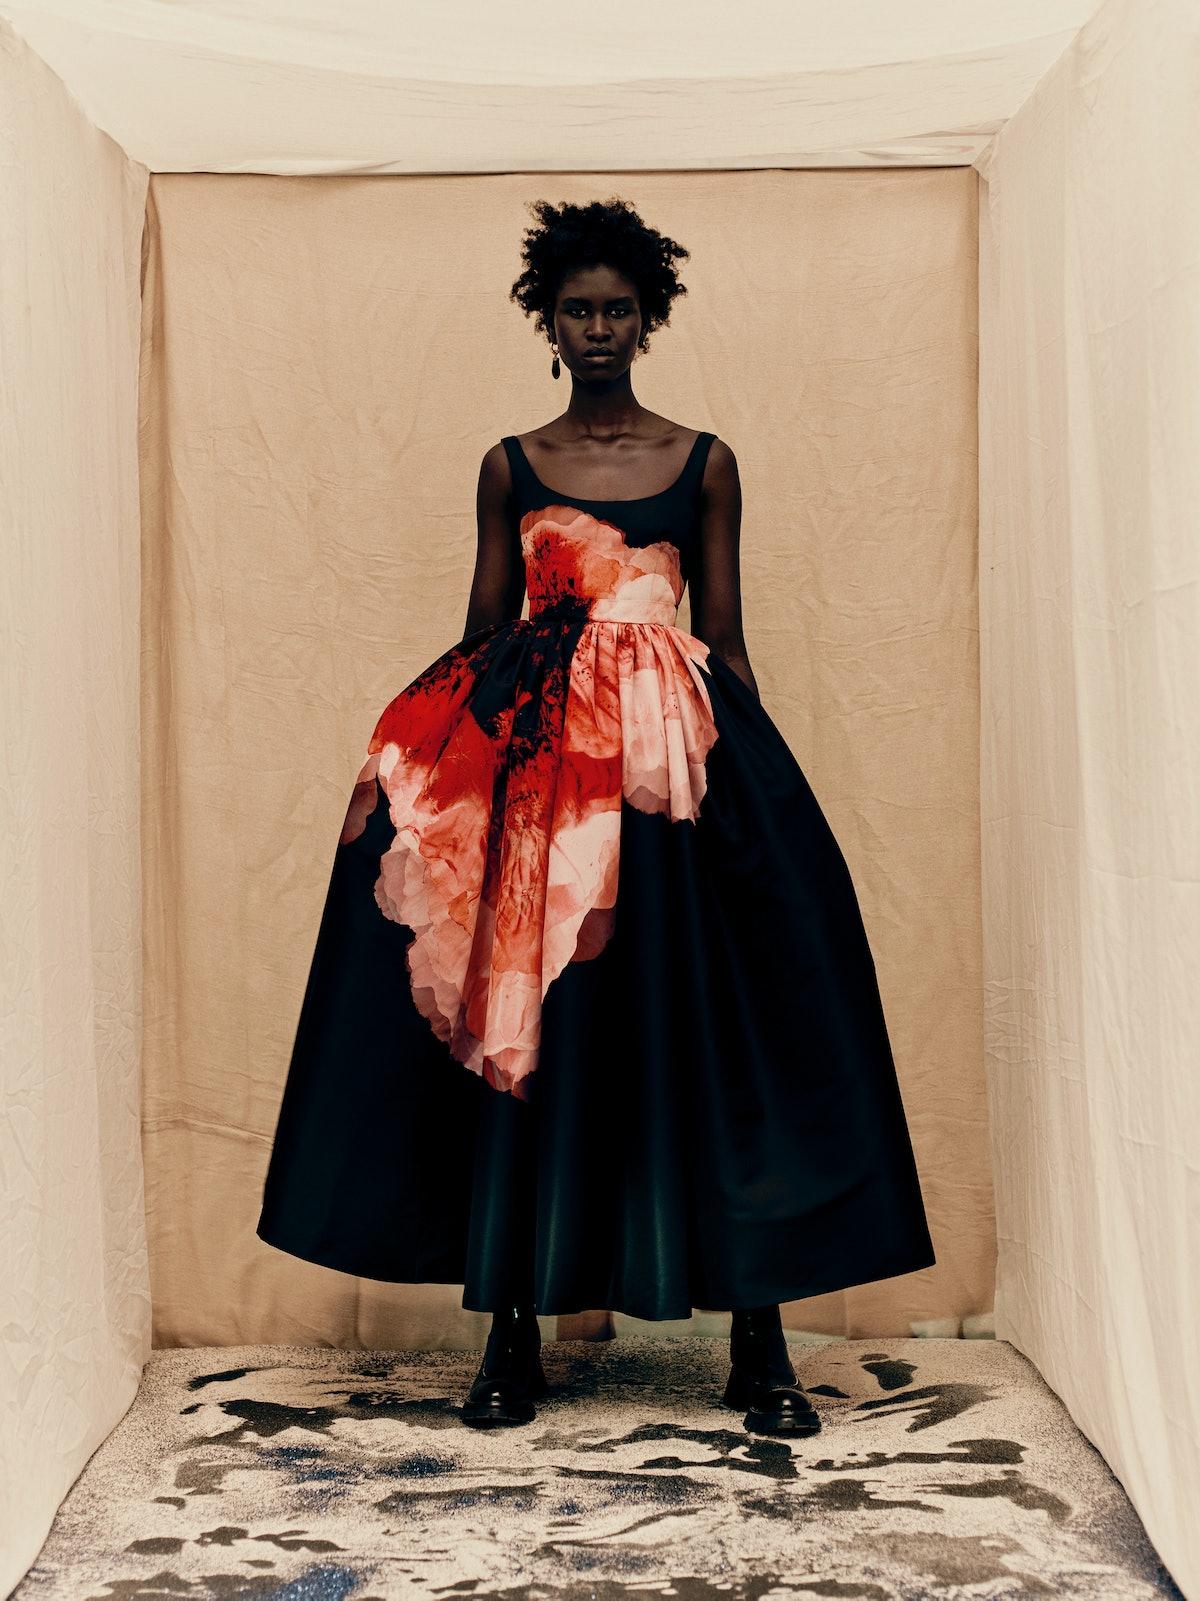 model in floral dress by Alexander McQueen